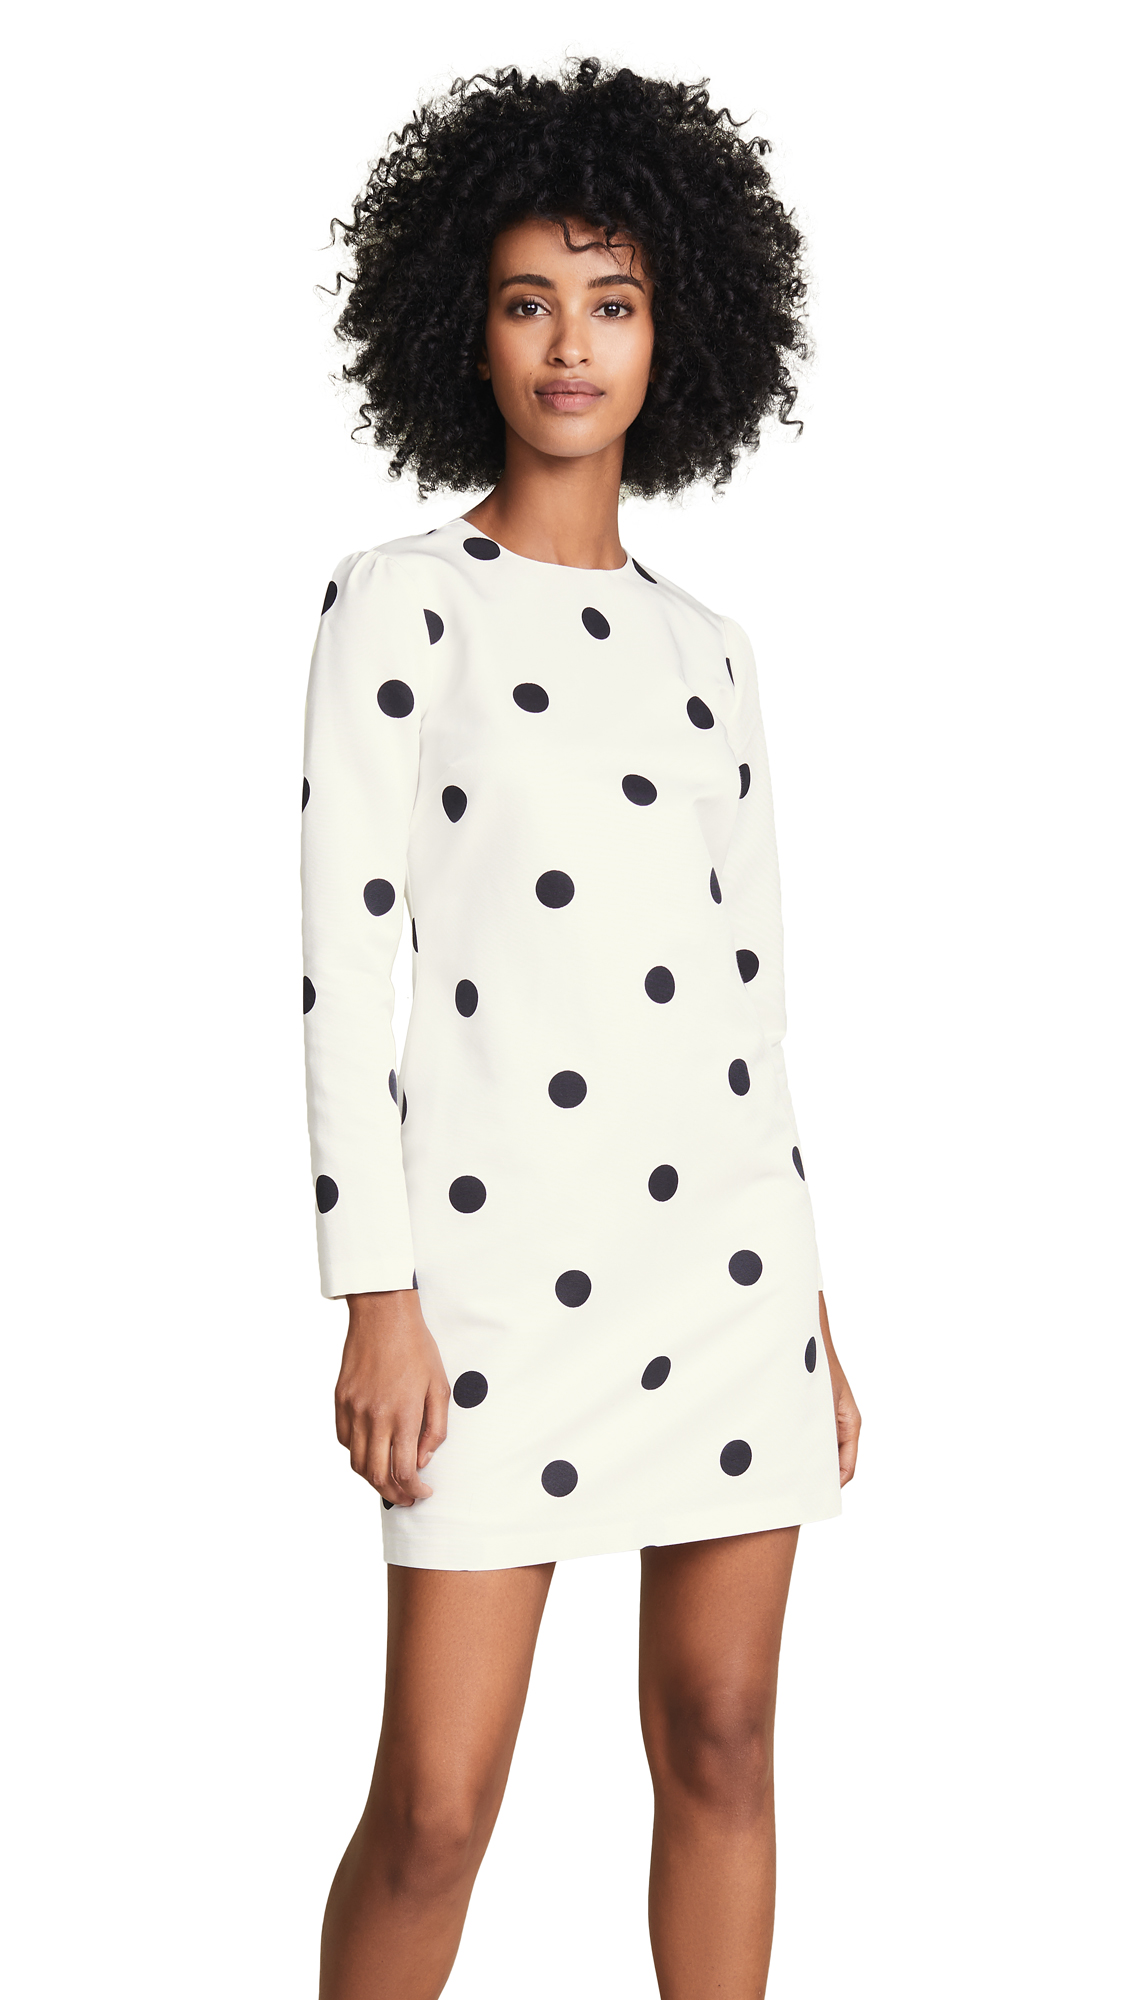 Cynthia Rowley Polka Dot Long Sleeve Shift Dress In Black Dot